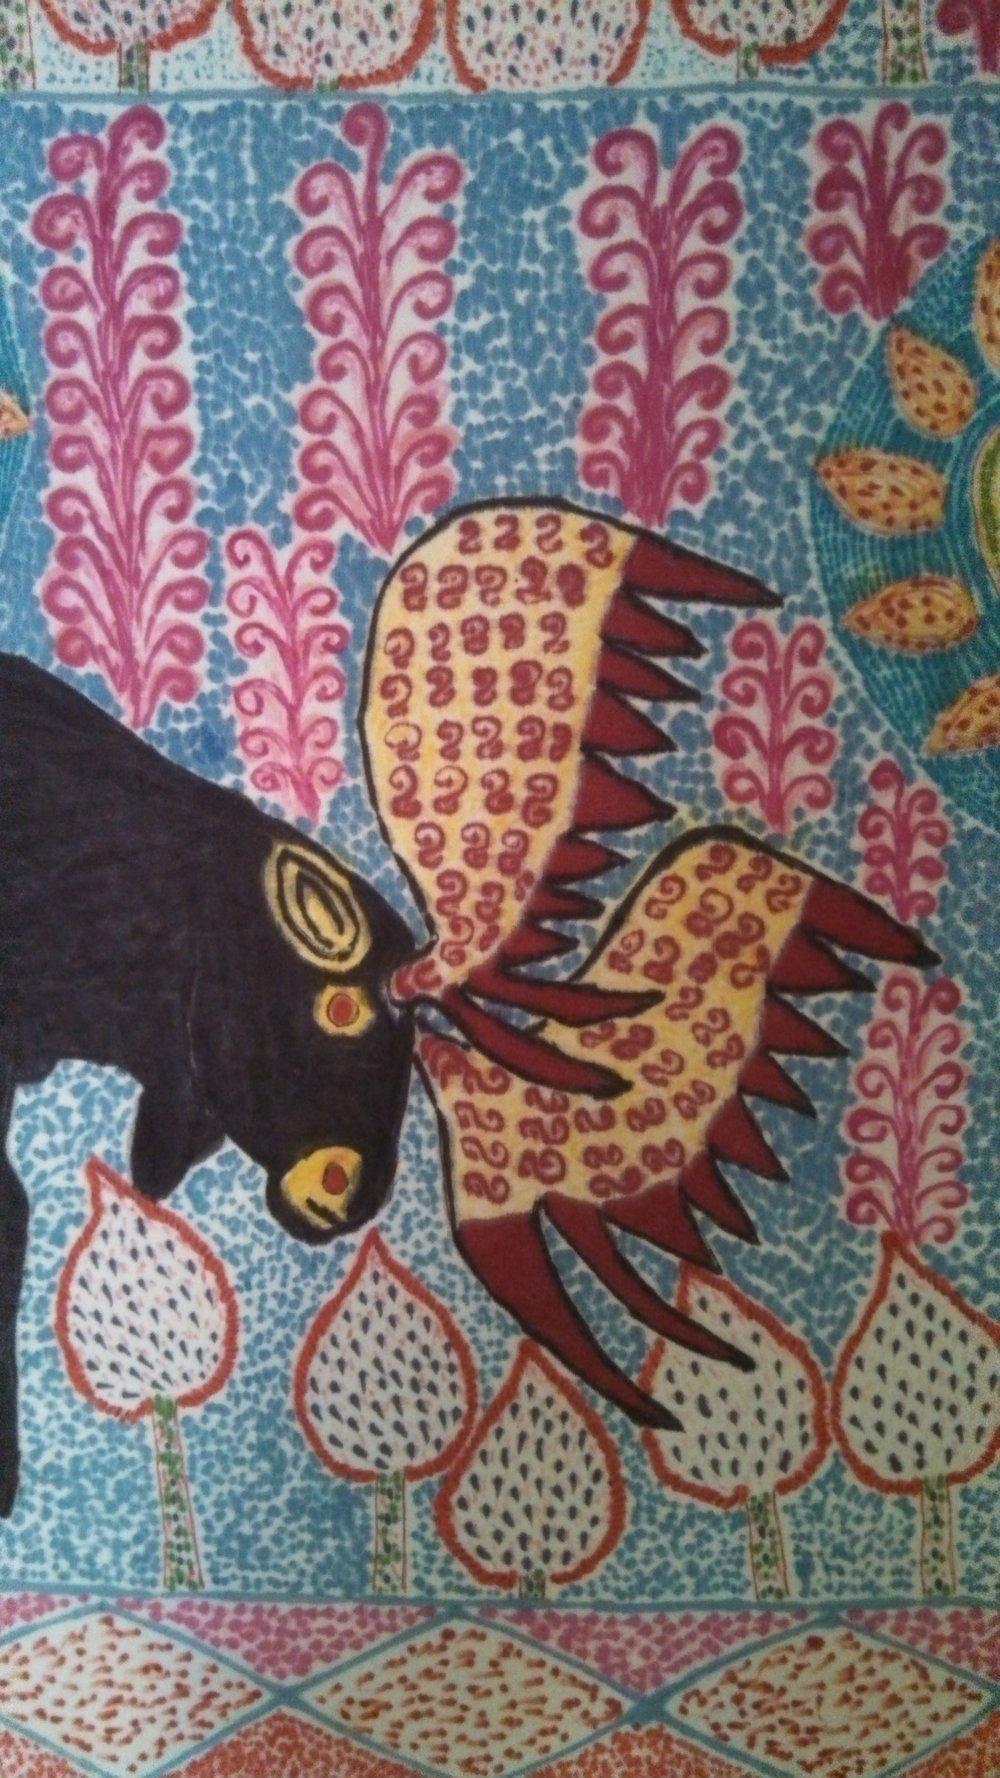 Peruvian folk art by Alberto Alcantara